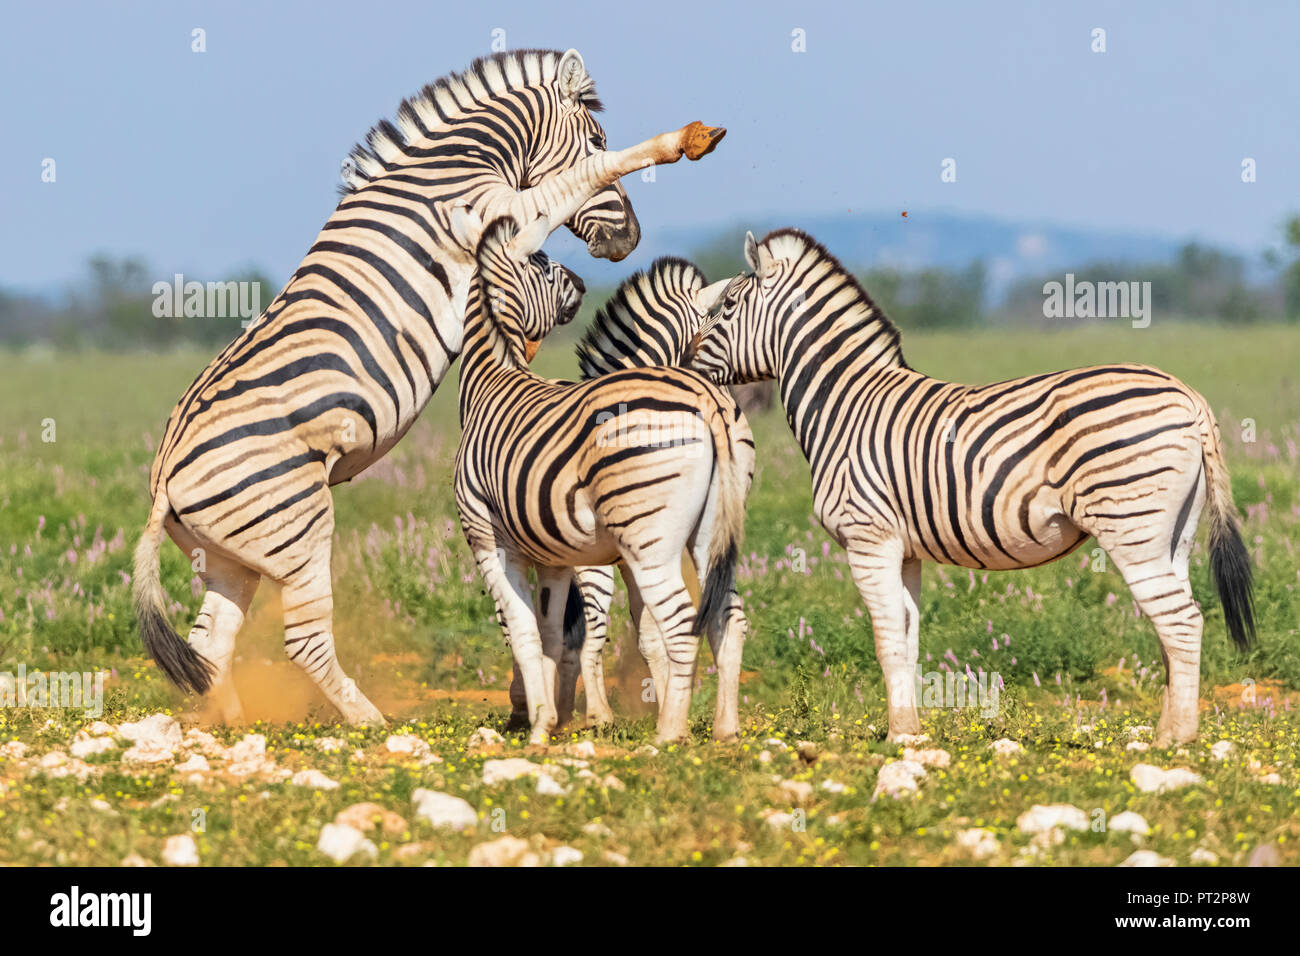 Africa, Namibia, Etosha National Park, burchell's zebras, Equus quagga burchelli, fighting - Stock Image